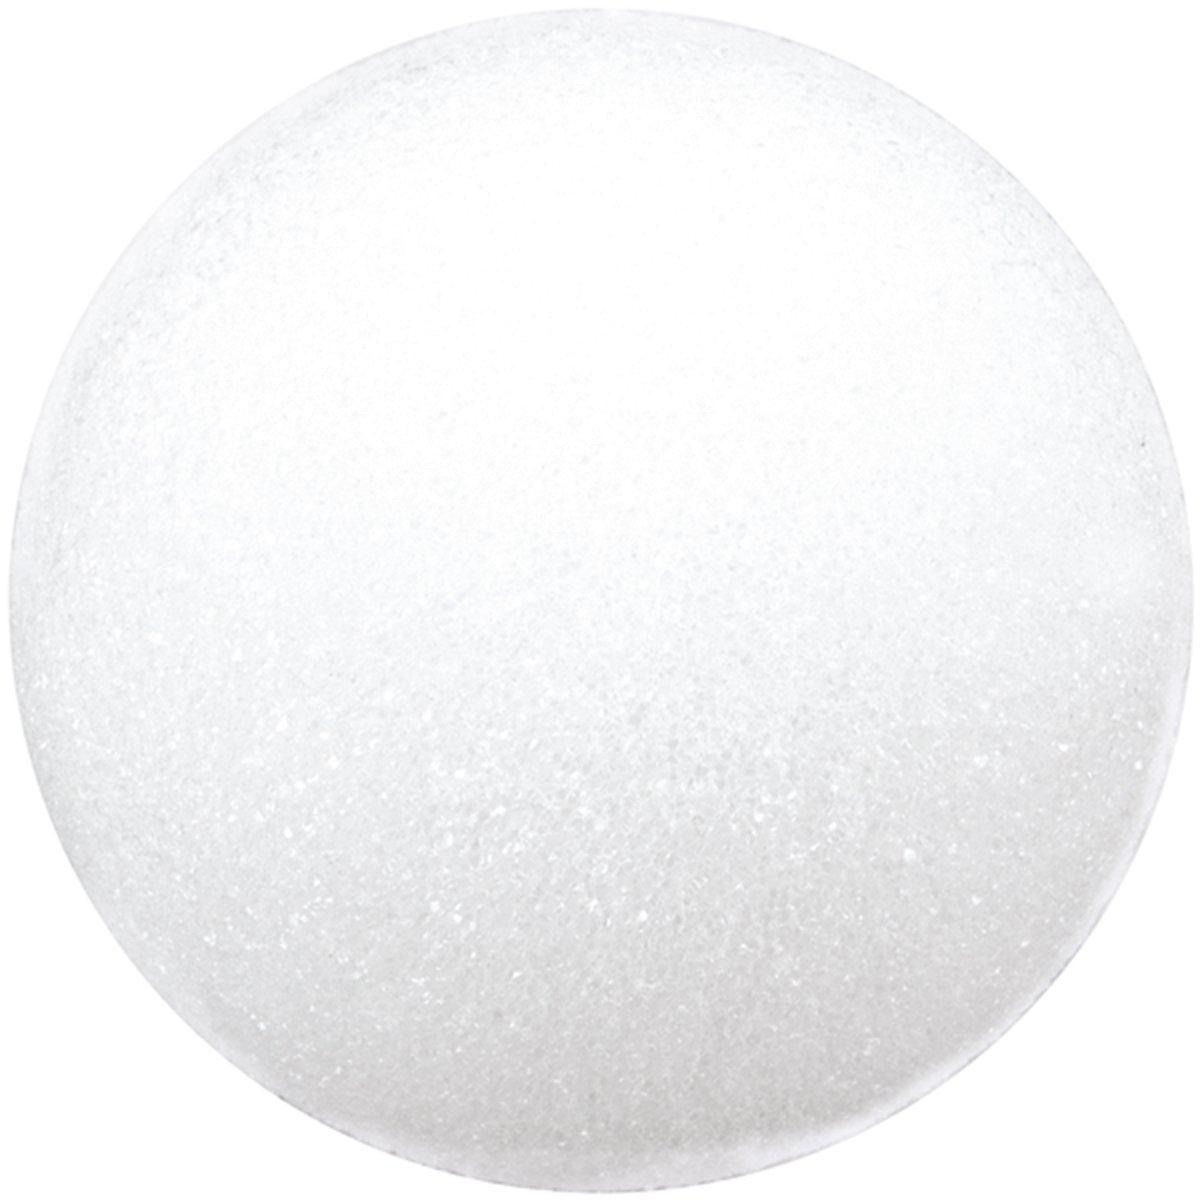 Floracraft Styrofoam Ball, 6-Inch, White BA6H